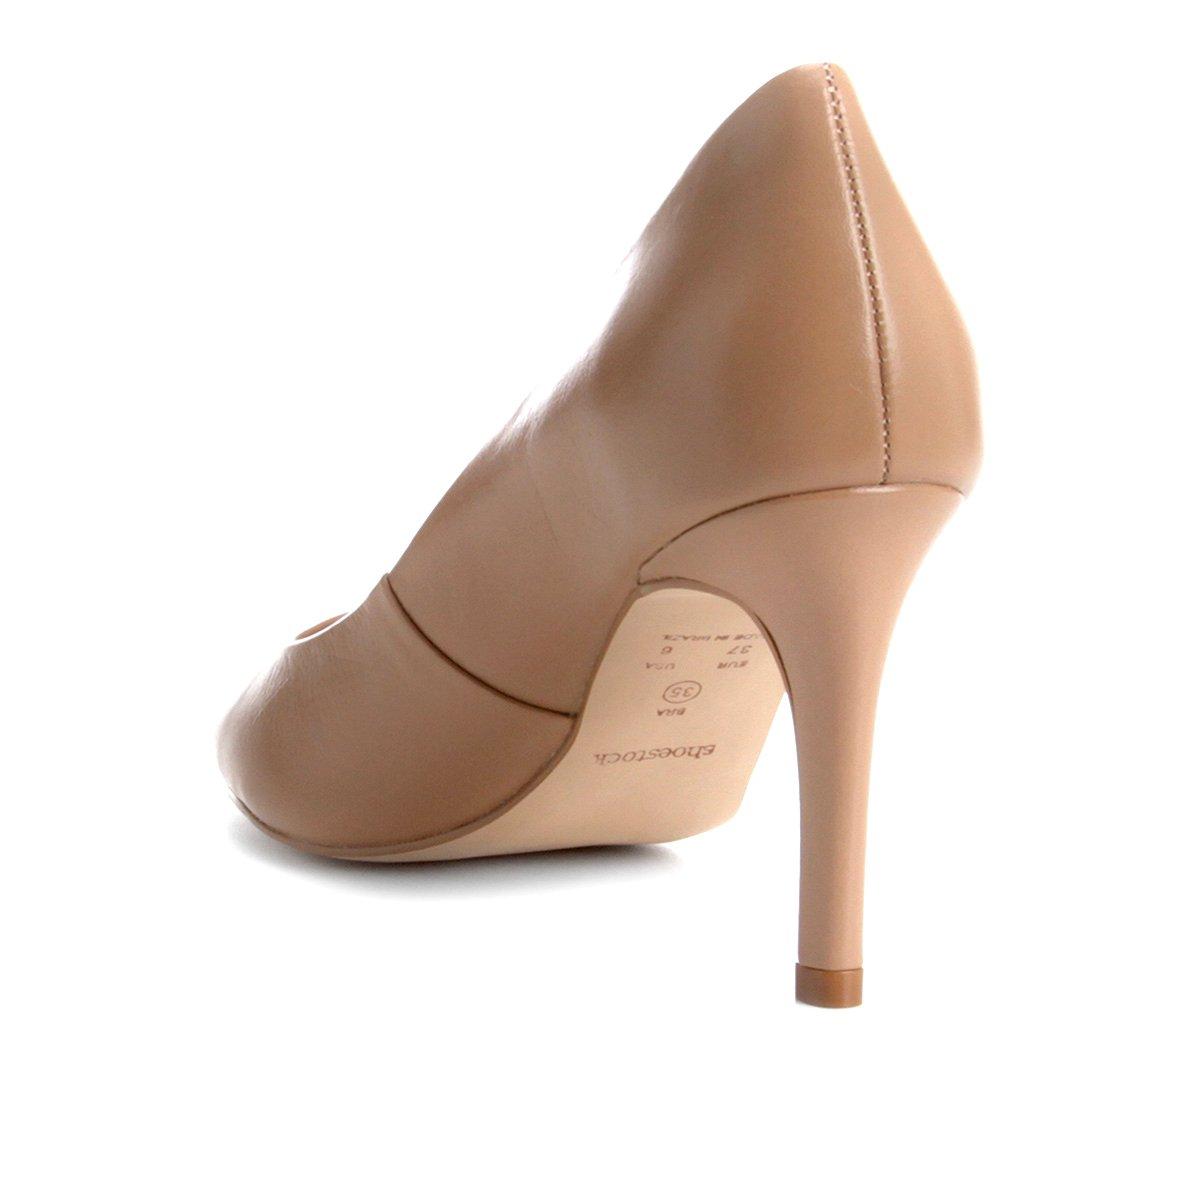 Alto Shoestock Couro Scarpin Salto Nude Couro Shoestock Básico Scarpin W4wSqvY7